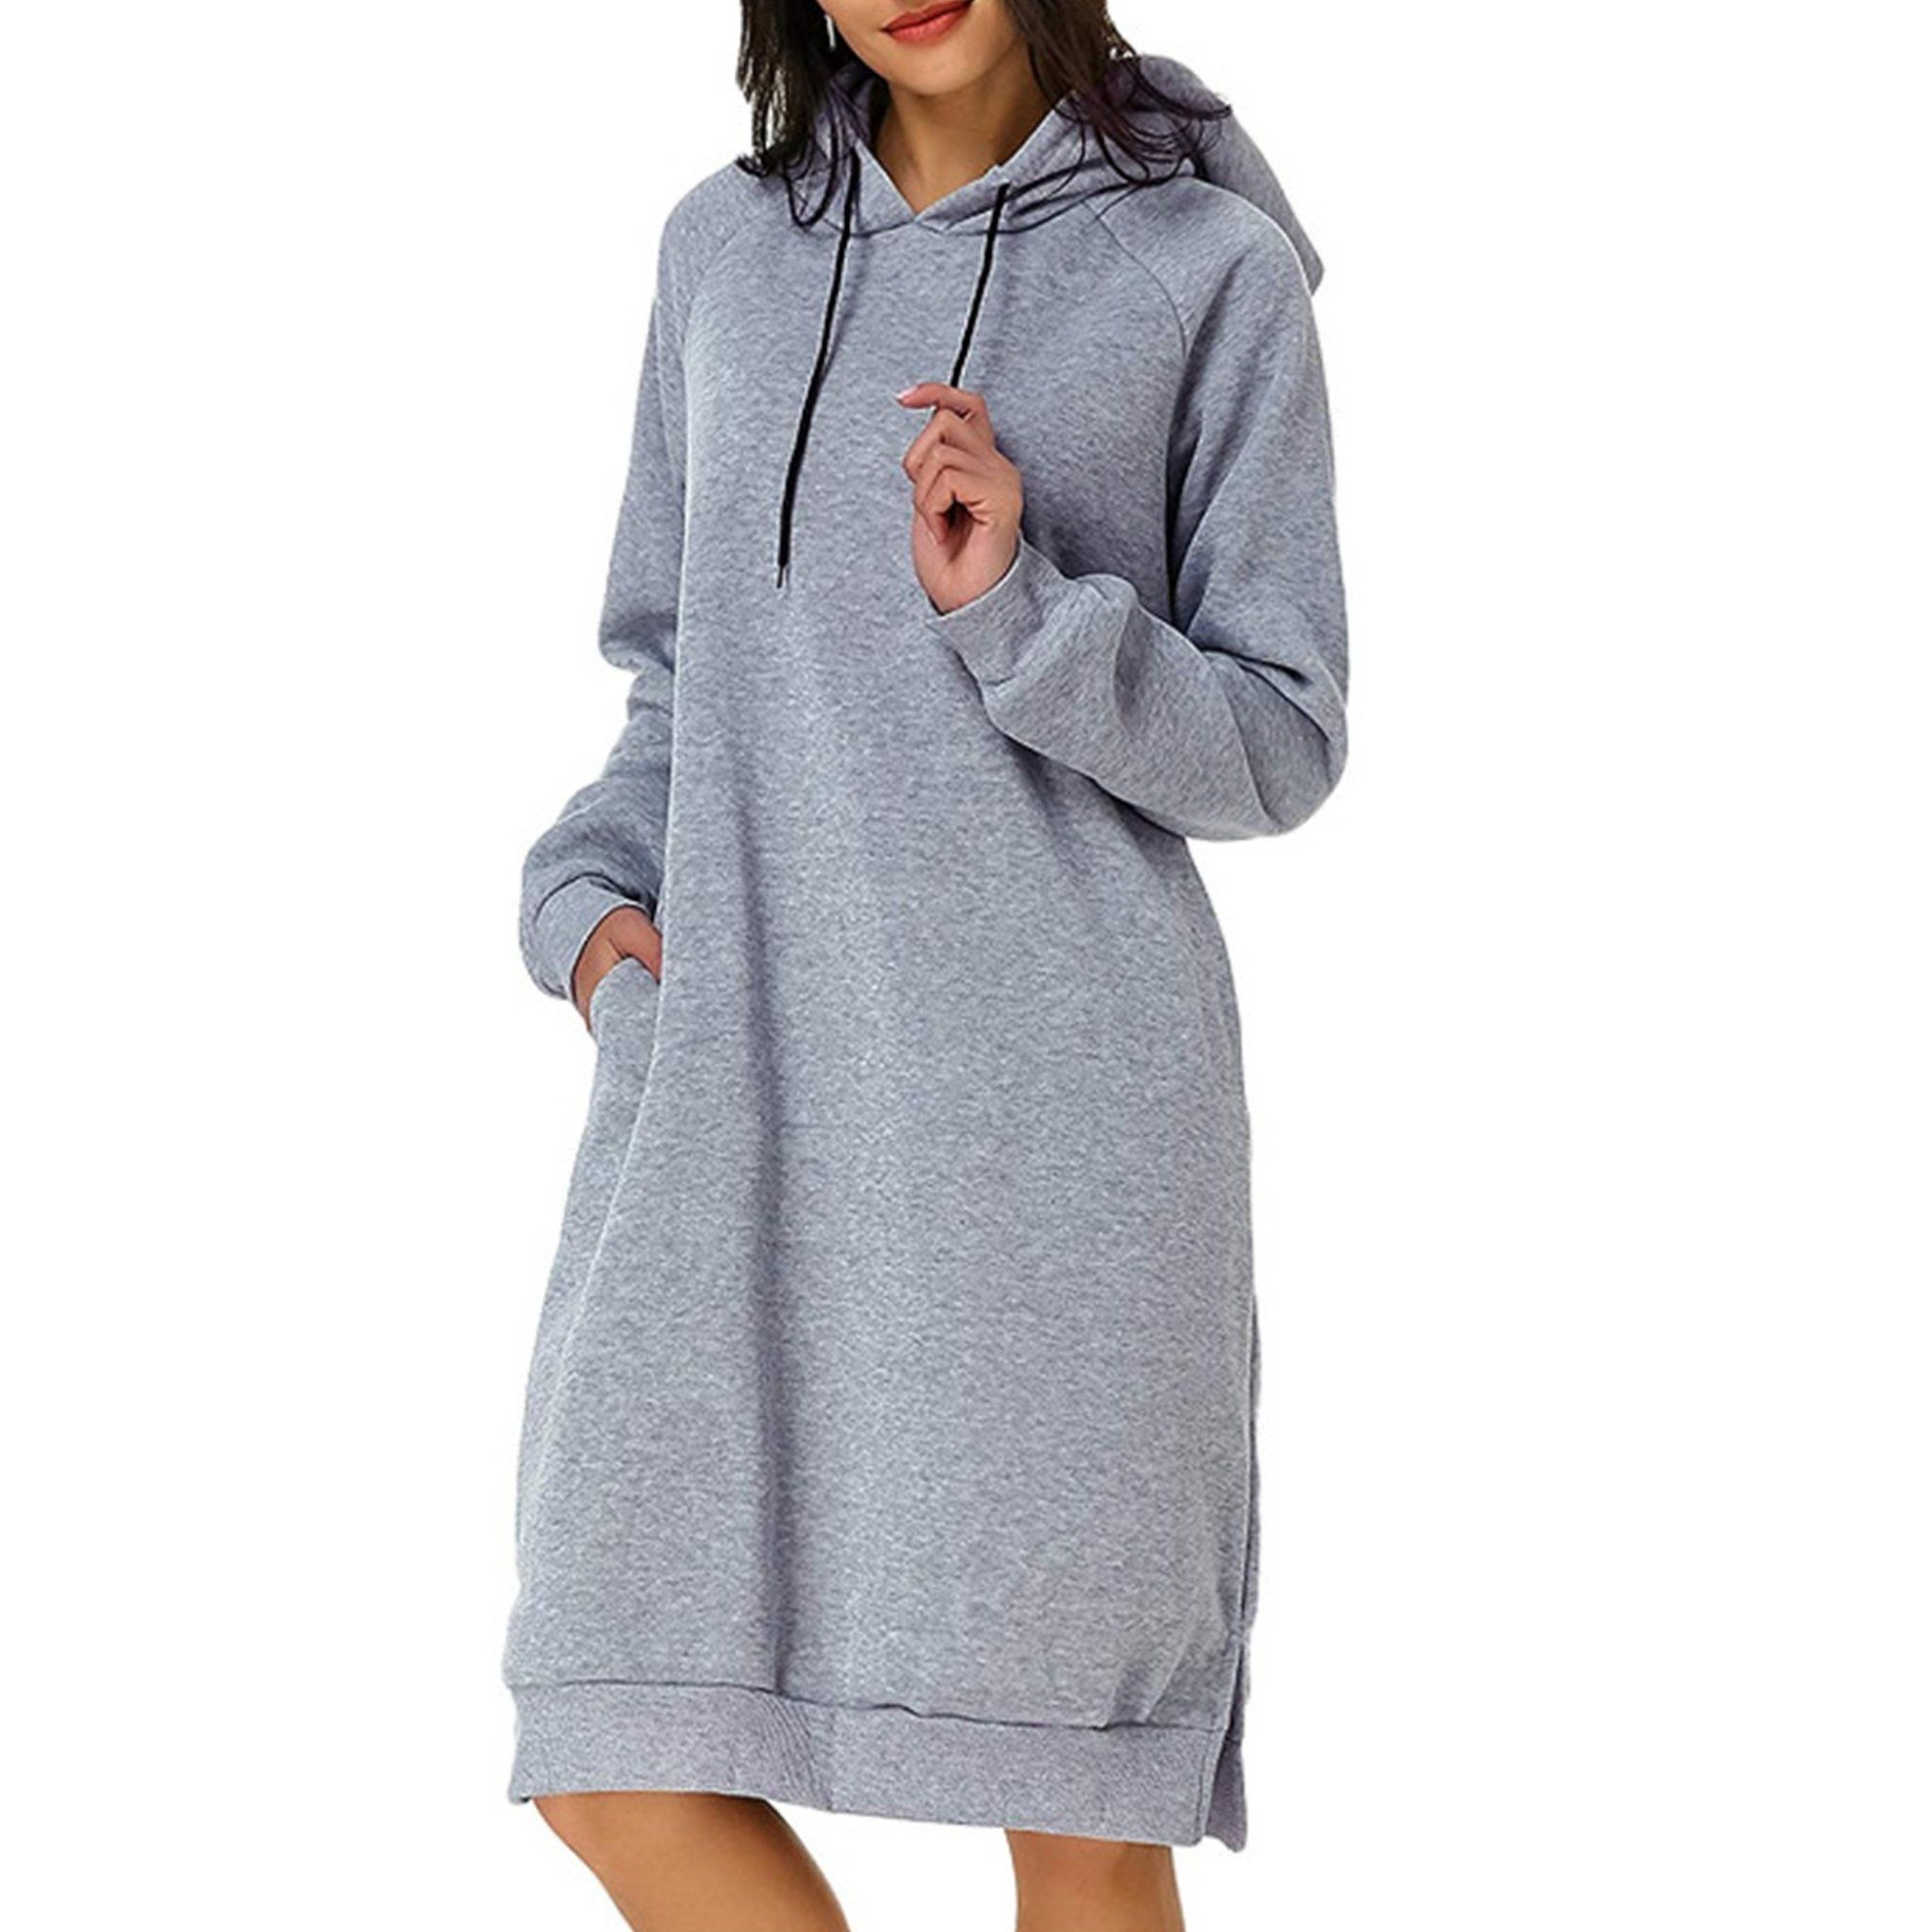 Amavo Avamo Casual Hooded Dress For Women Hoodie Jumper Pullover Sweatshirt Tops Ladies Long Sleeve Casual Pocket Dress Knee Length Walmart Com Hoodie Dress Sweatshirts Women Long Hoodie [ 2000 x 2000 Pixel ]